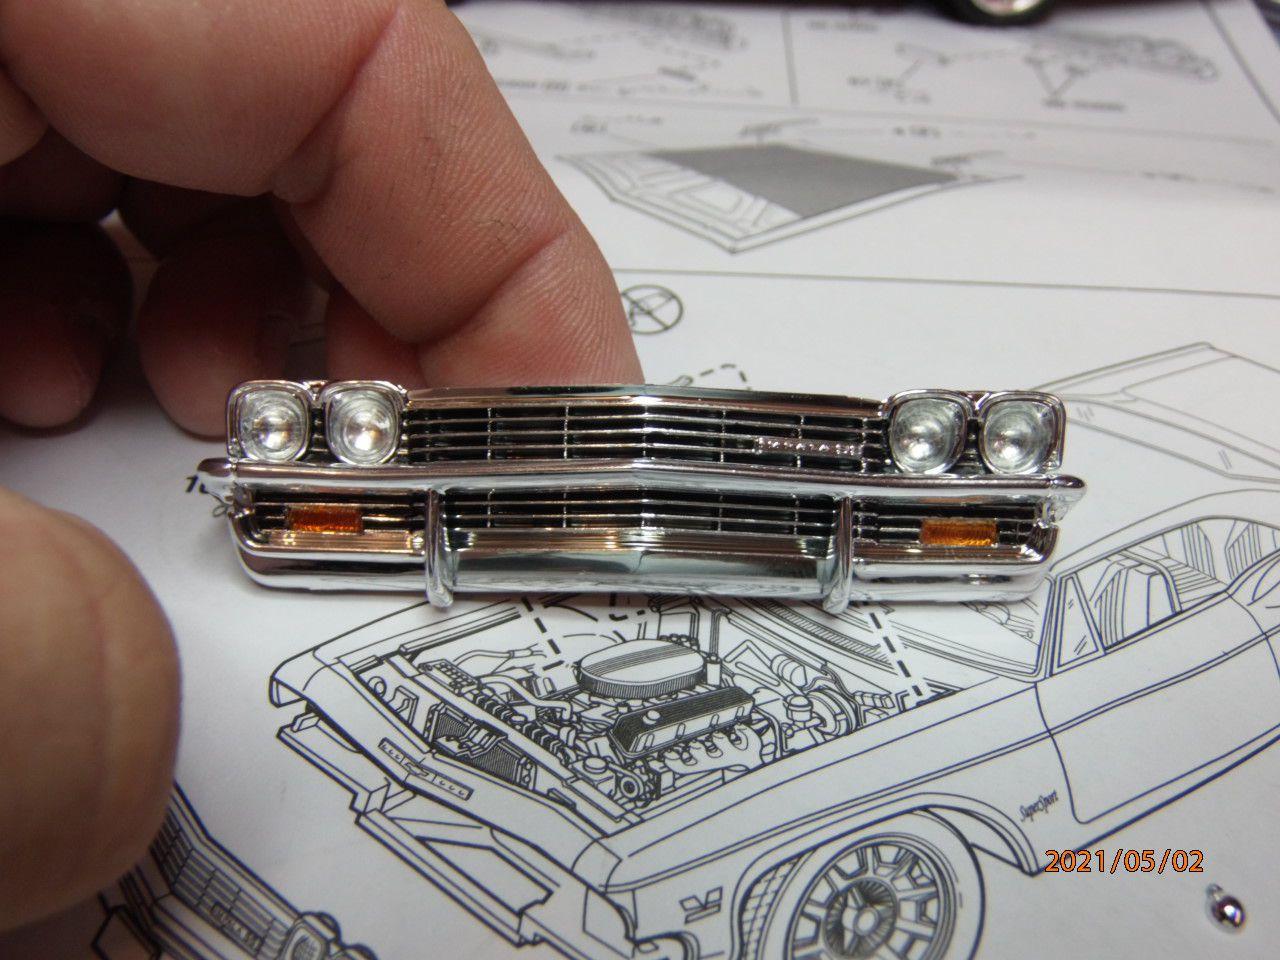 65 Chevrolet Impala foose     3/3